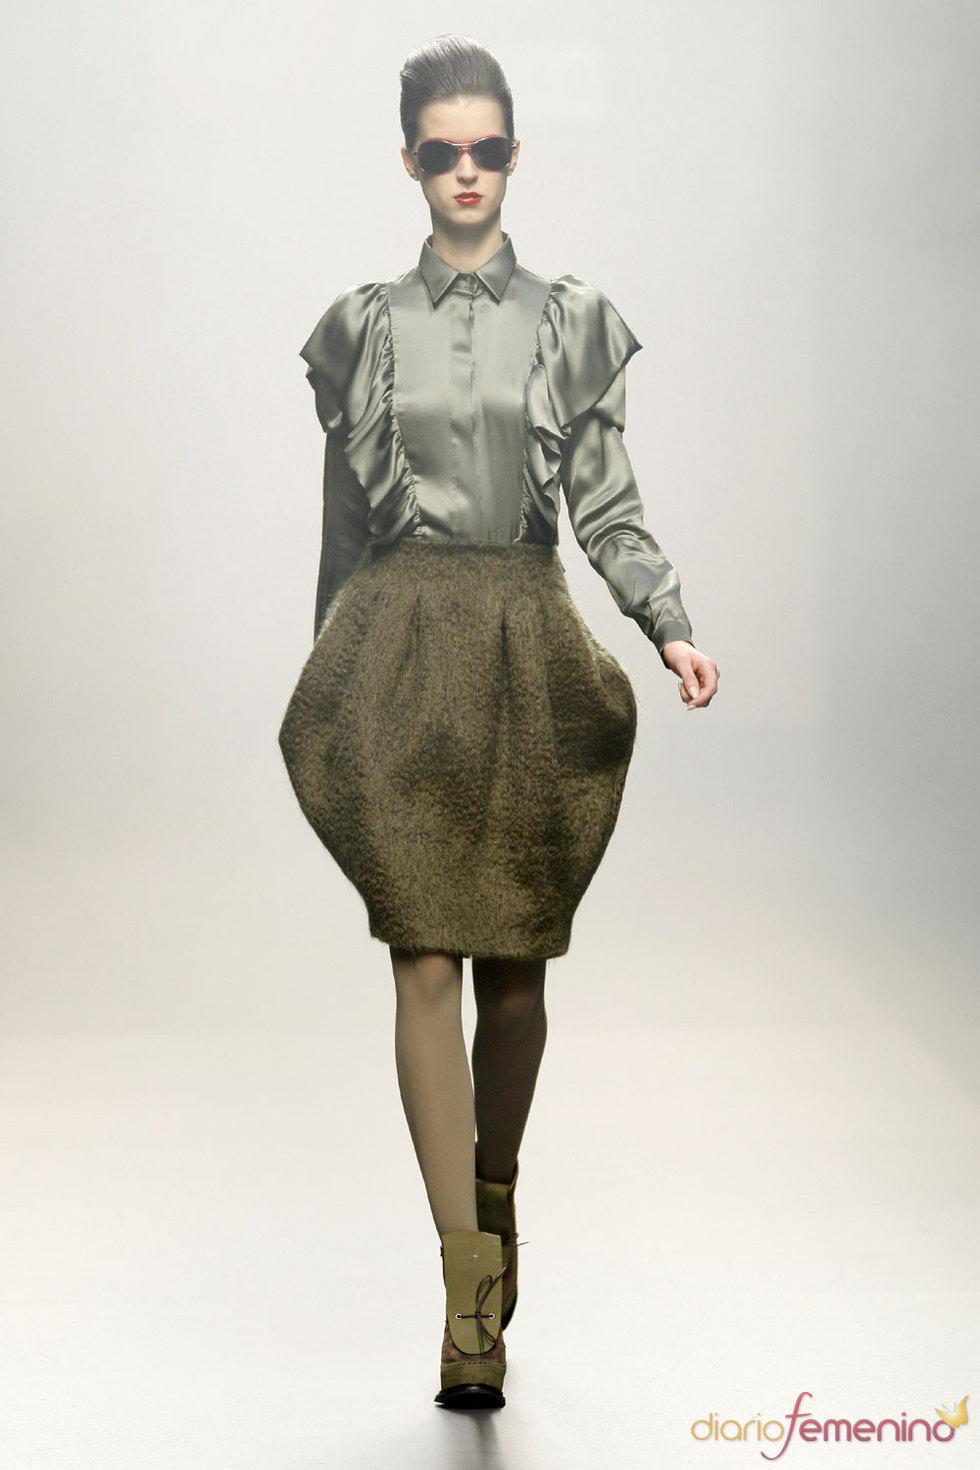 Moda Mujer - Antonio Alvarado